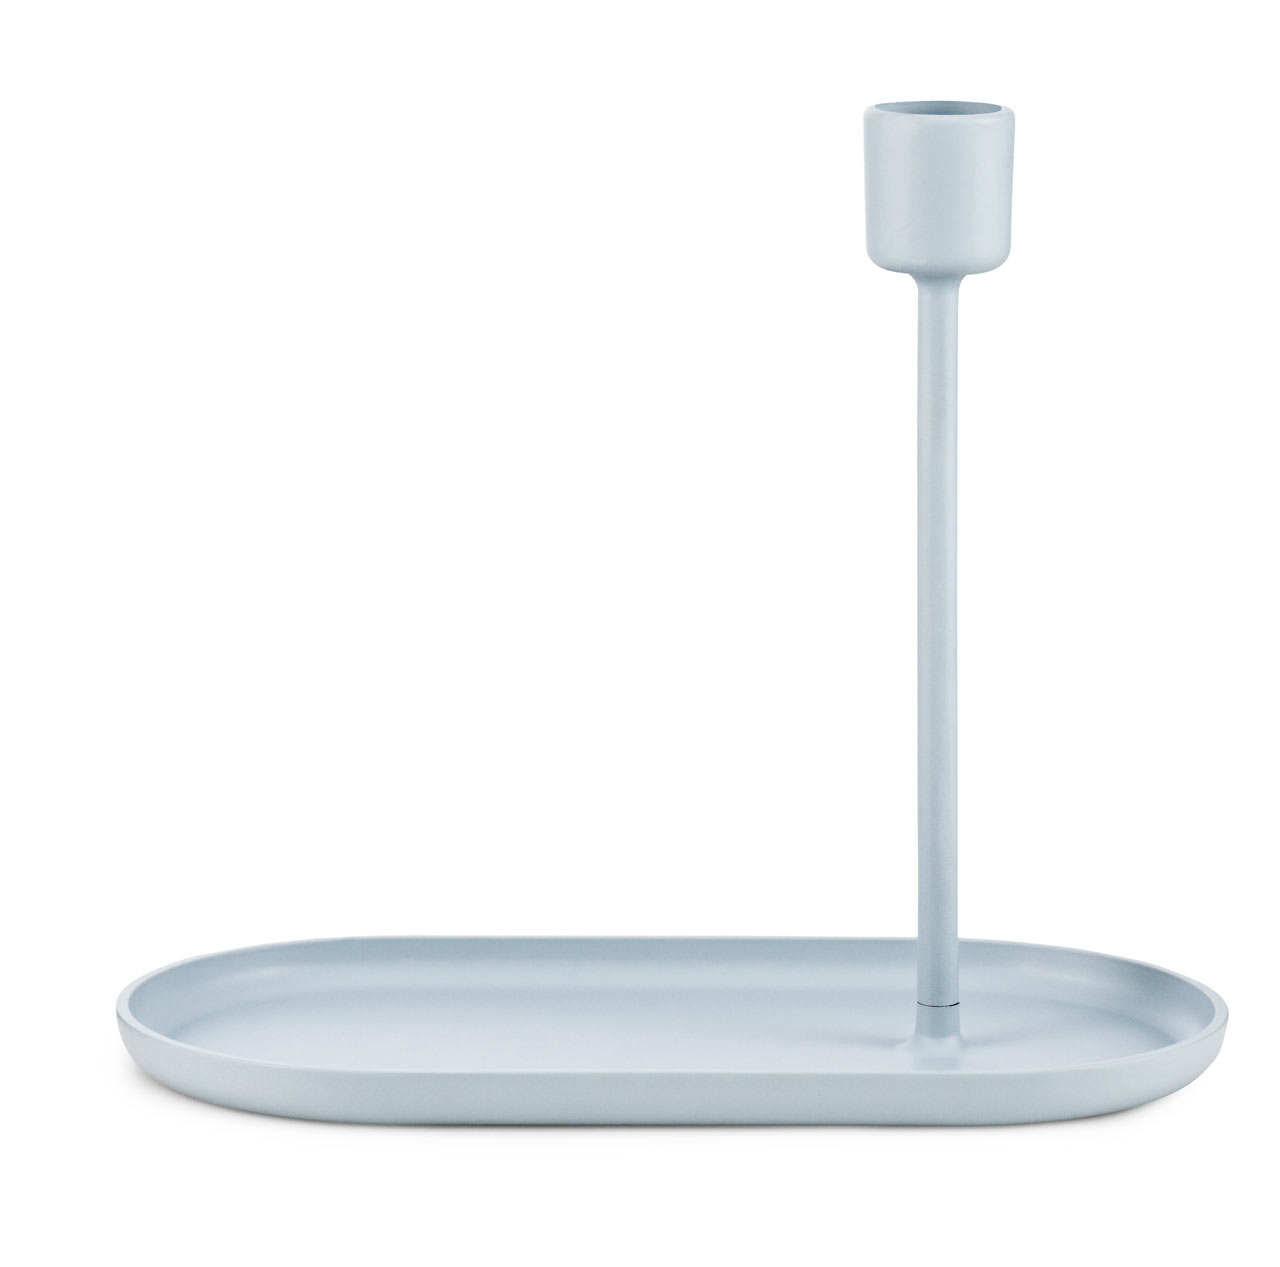 Folk-Candleholders-Simon-Legald-Normann-Copenhagen-8-Candlestick_Tray_Blue